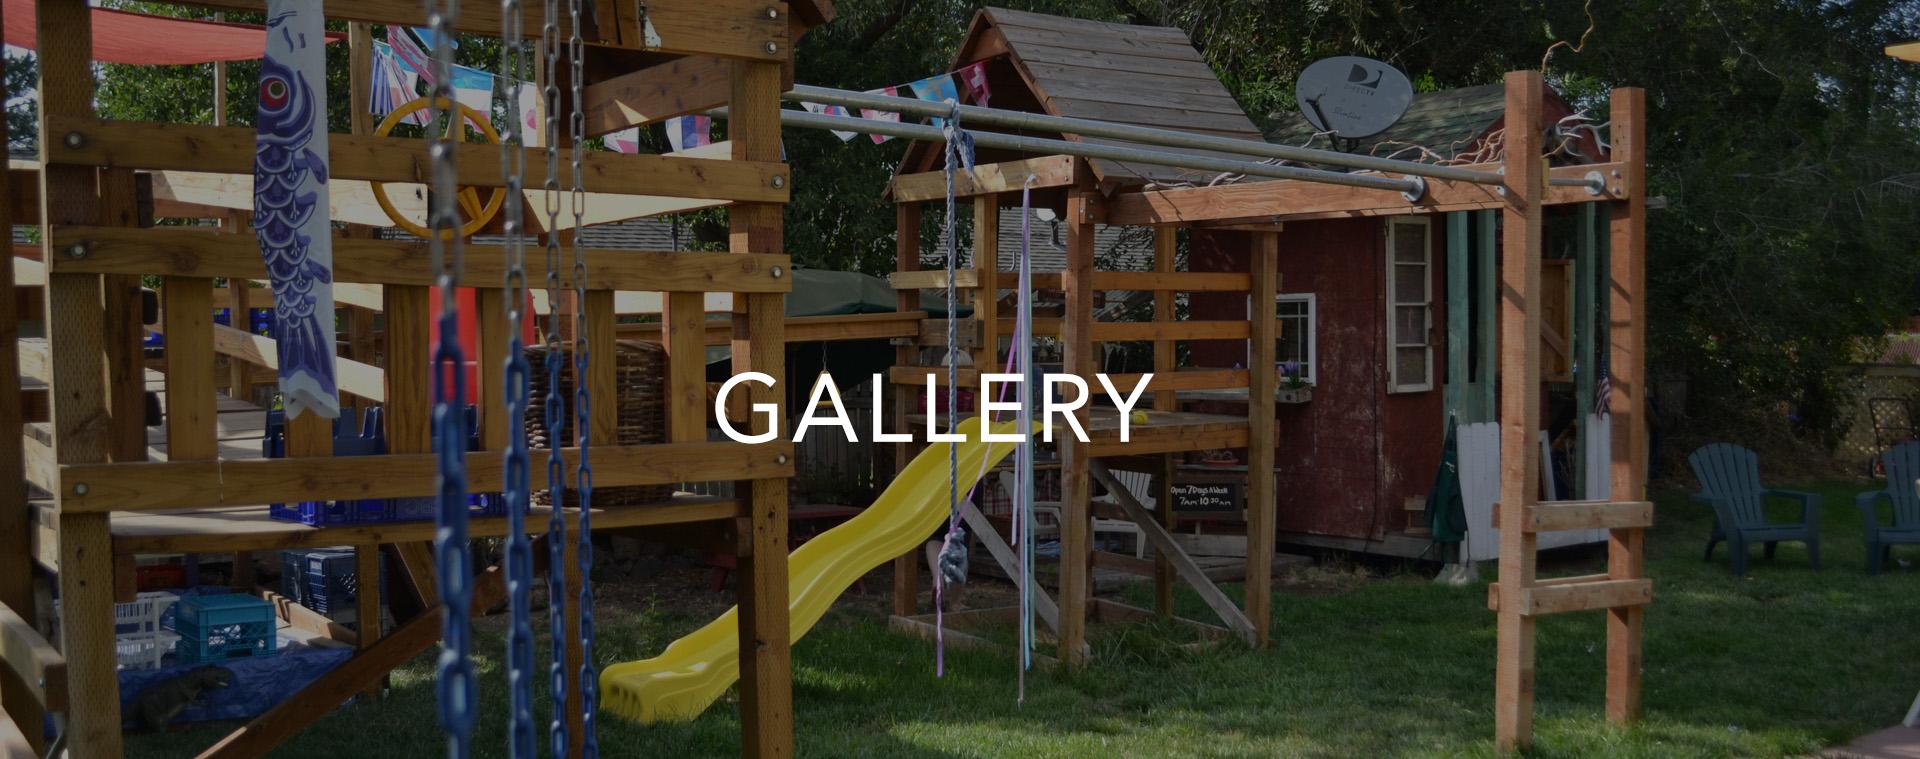 redmond preschools home redmond preschool kidinc 918